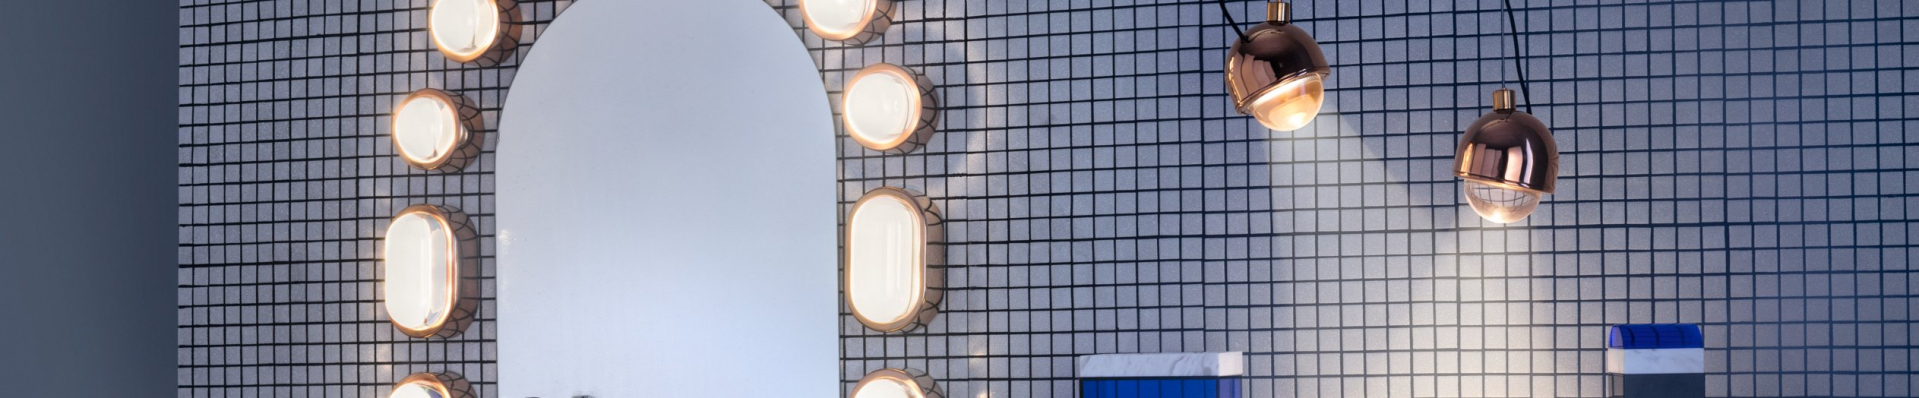 Tom Dixon badkamerlampen